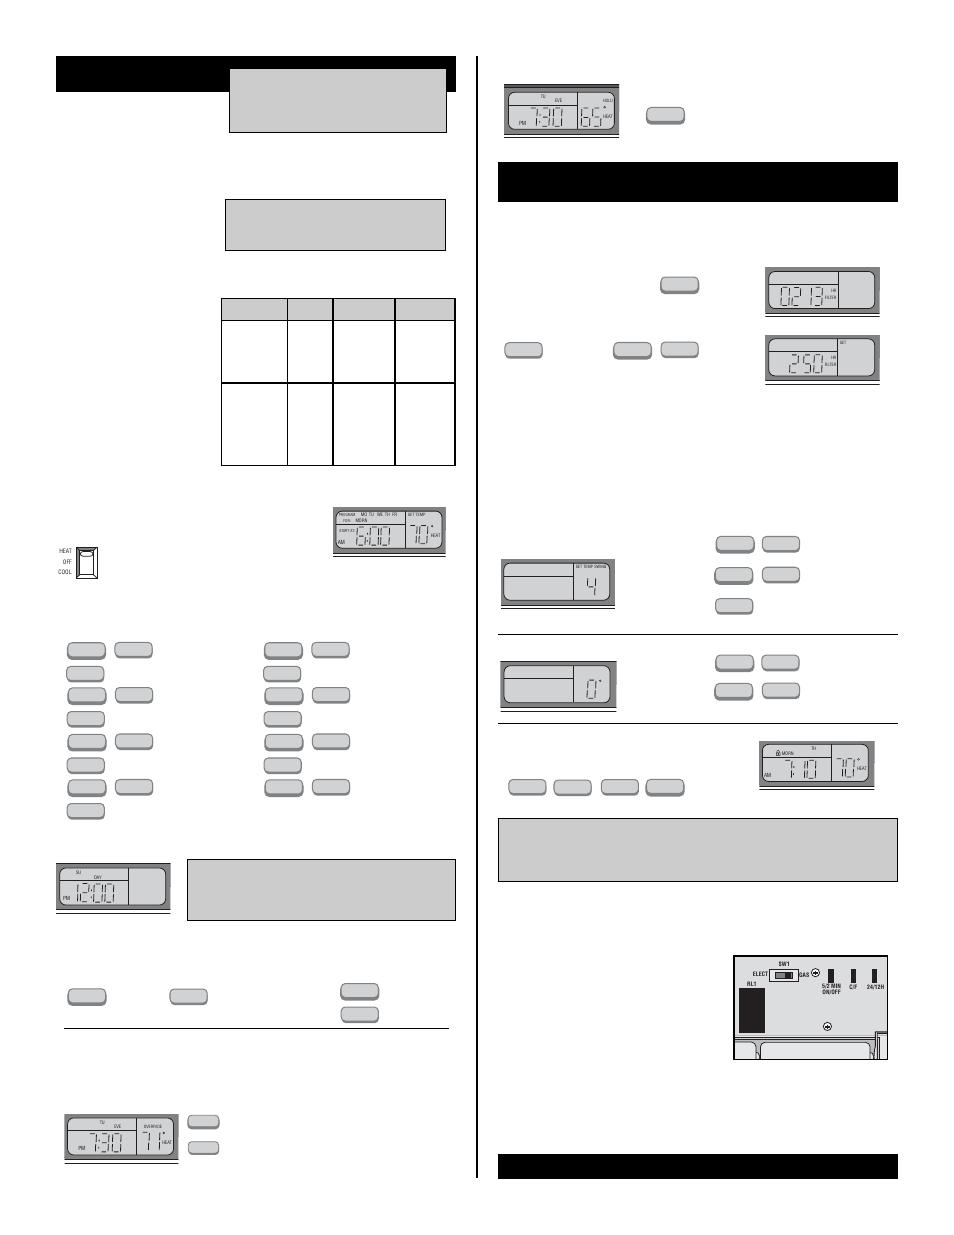 Tx1500e Manual